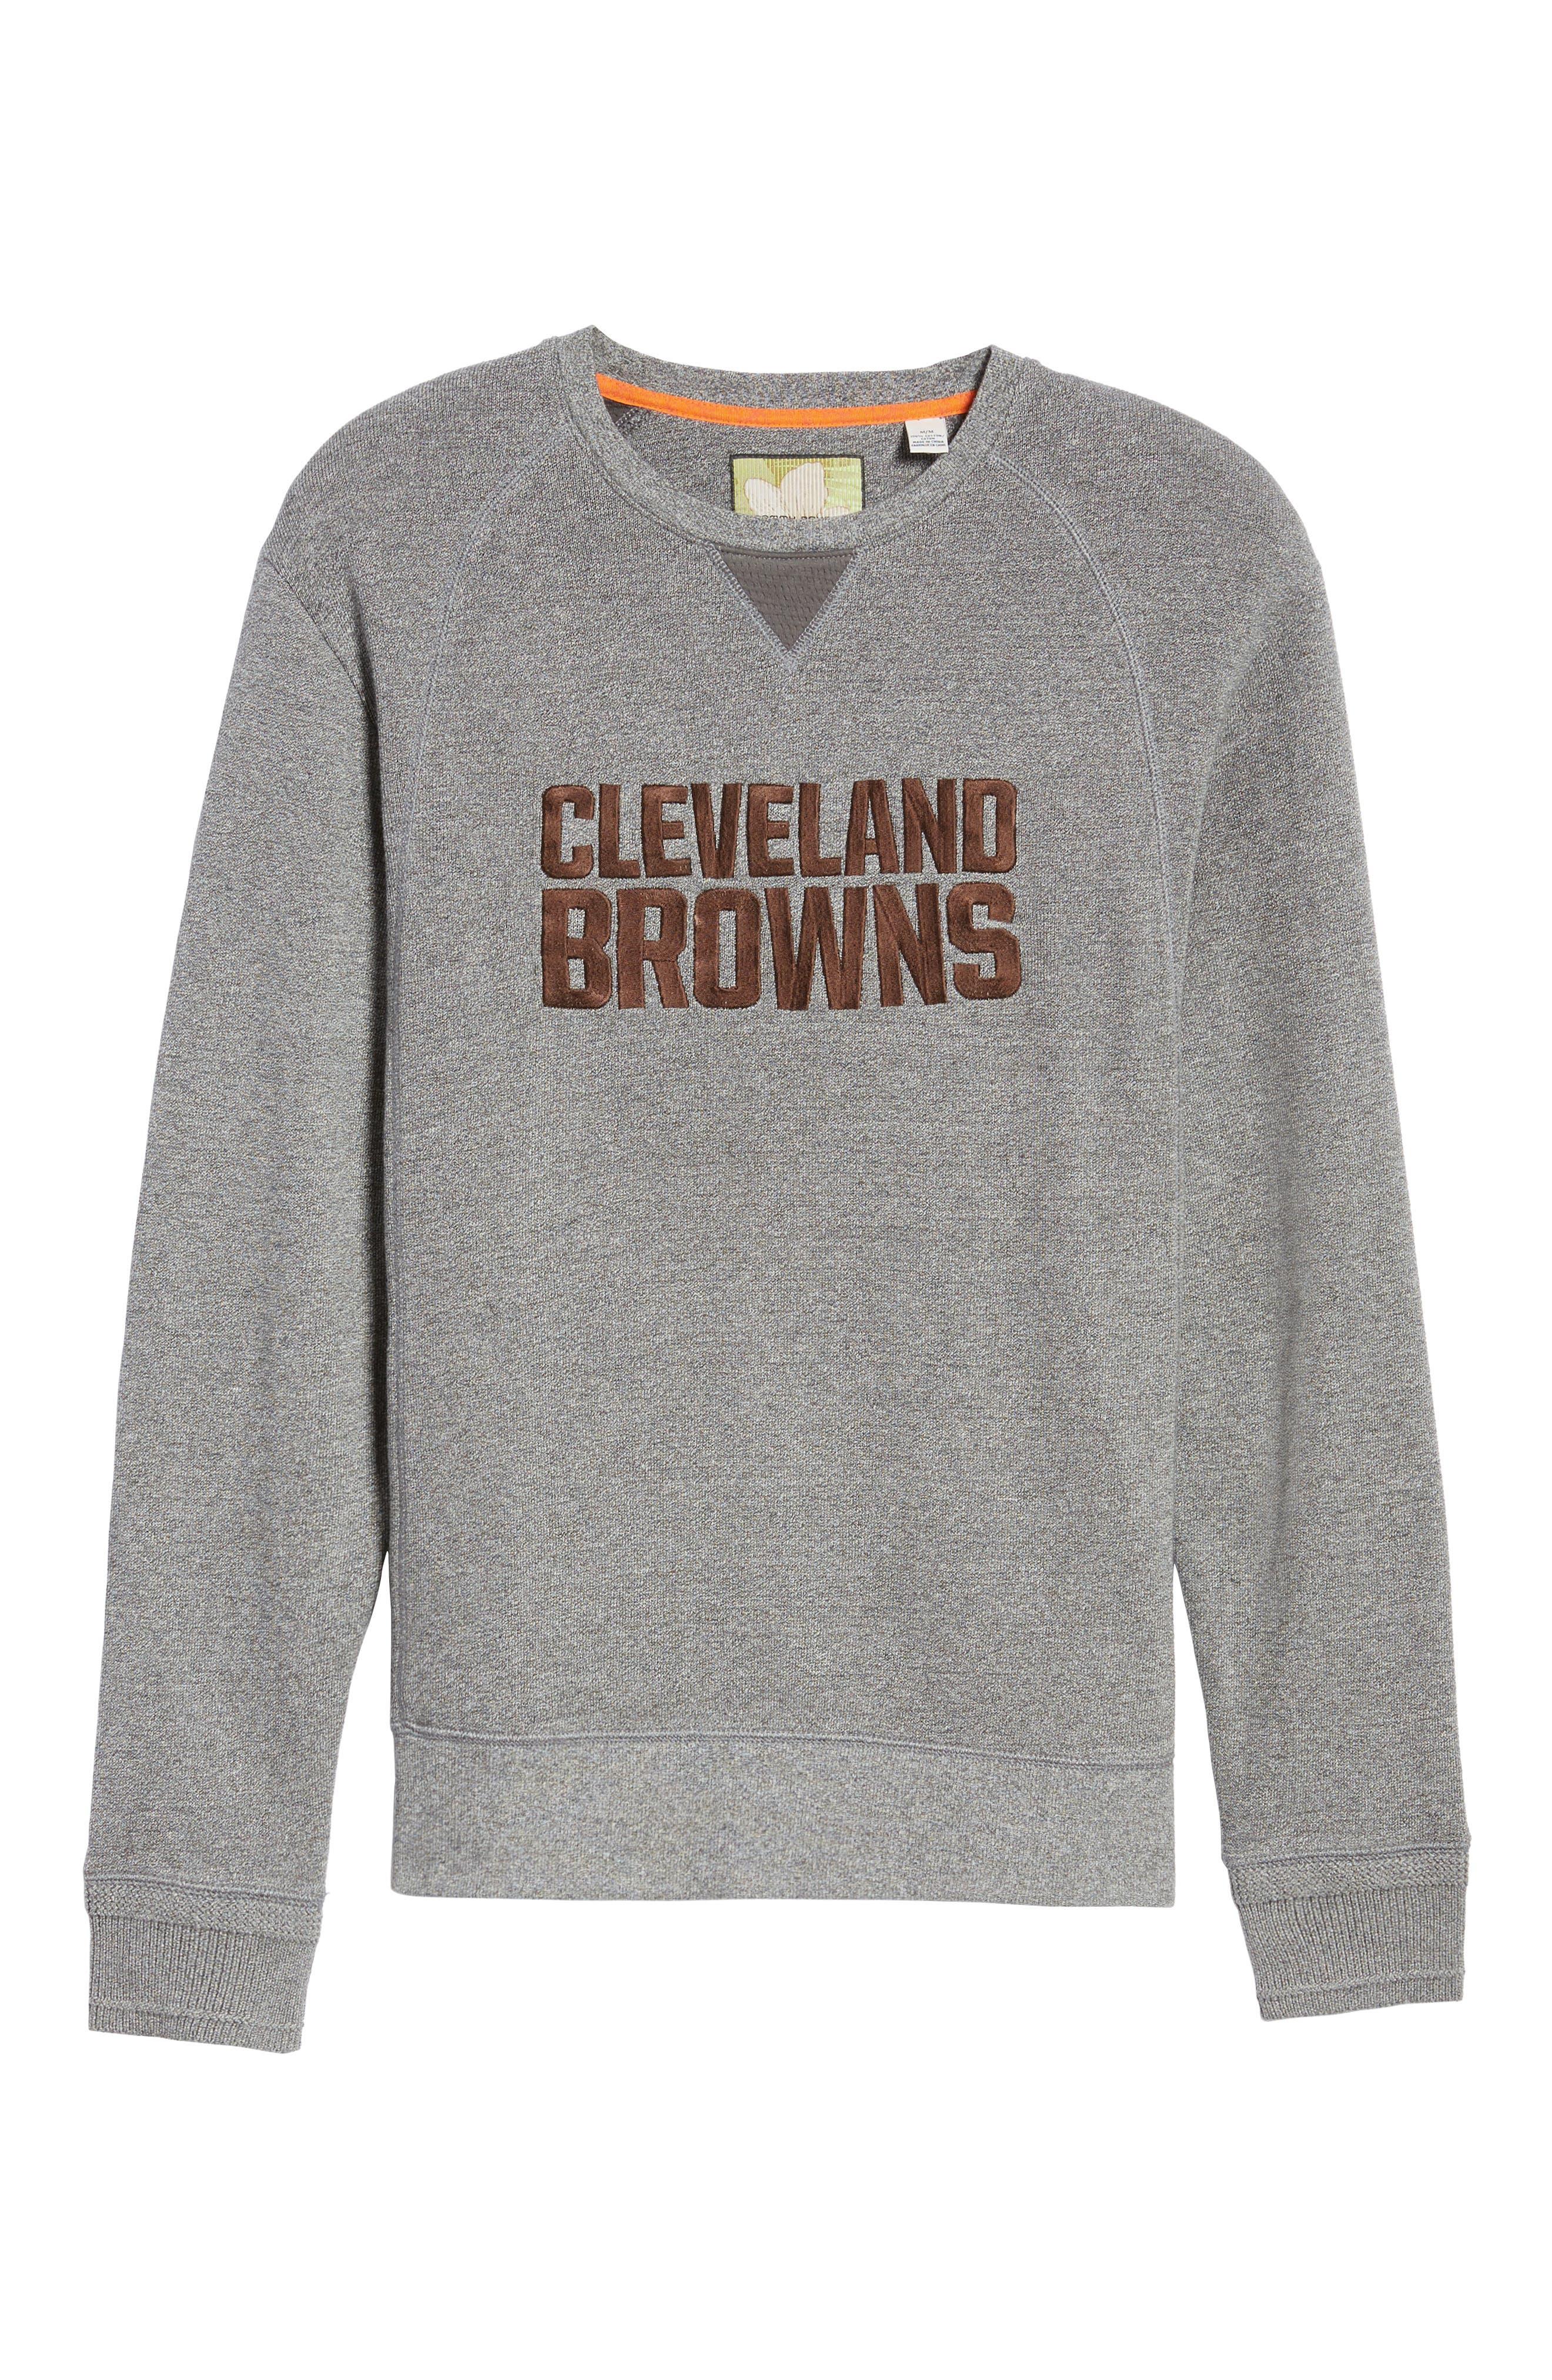 NFL Stitch of Liberty Embroidered Crewneck Sweatshirt,                             Alternate thumbnail 159, color,